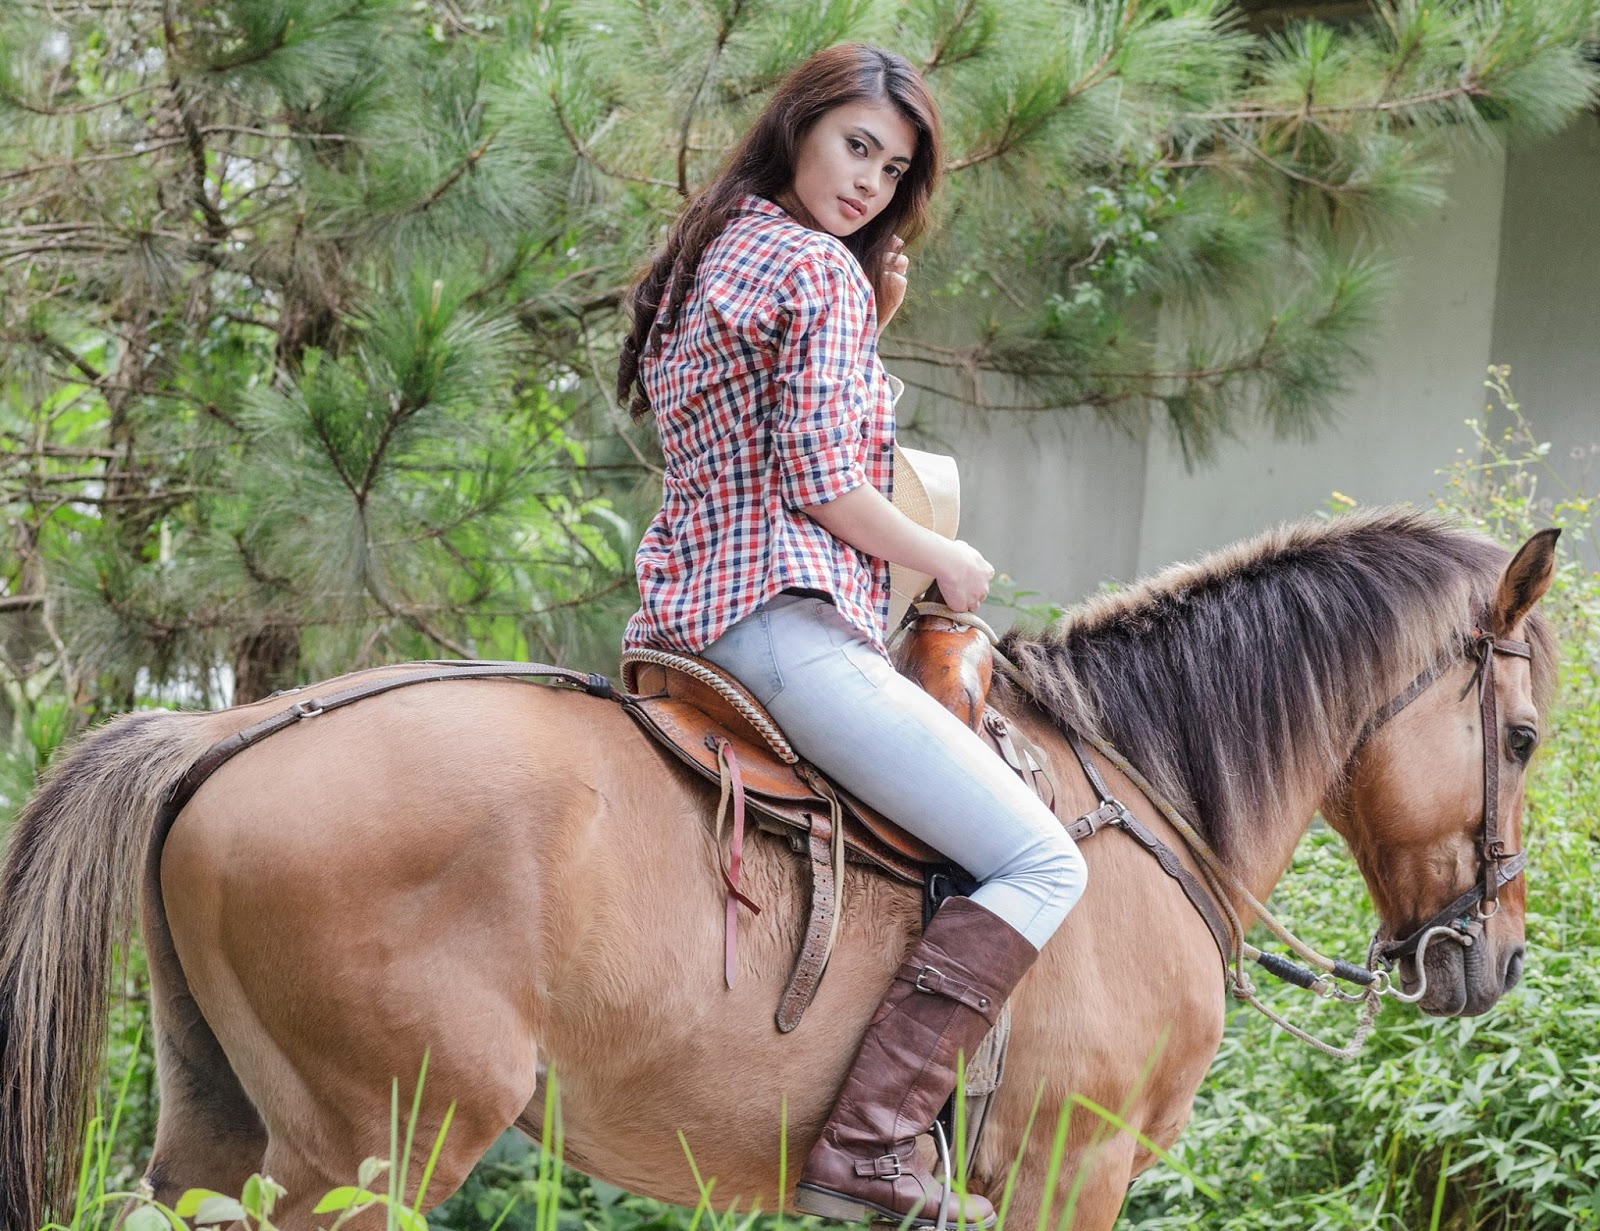 Equine Model Portrait Photography